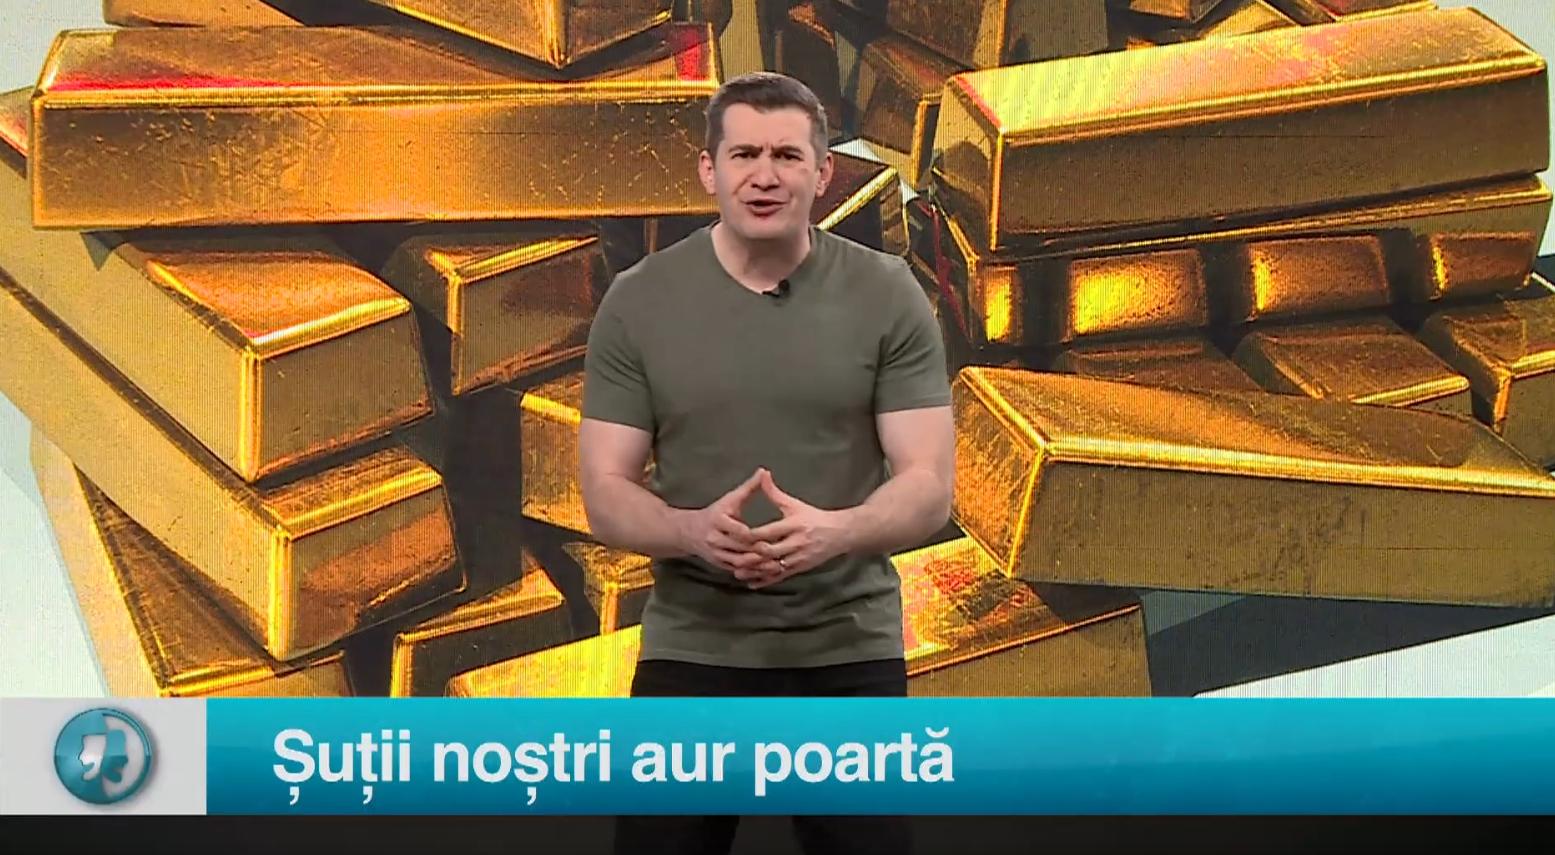 Șuții noștri aur poartă